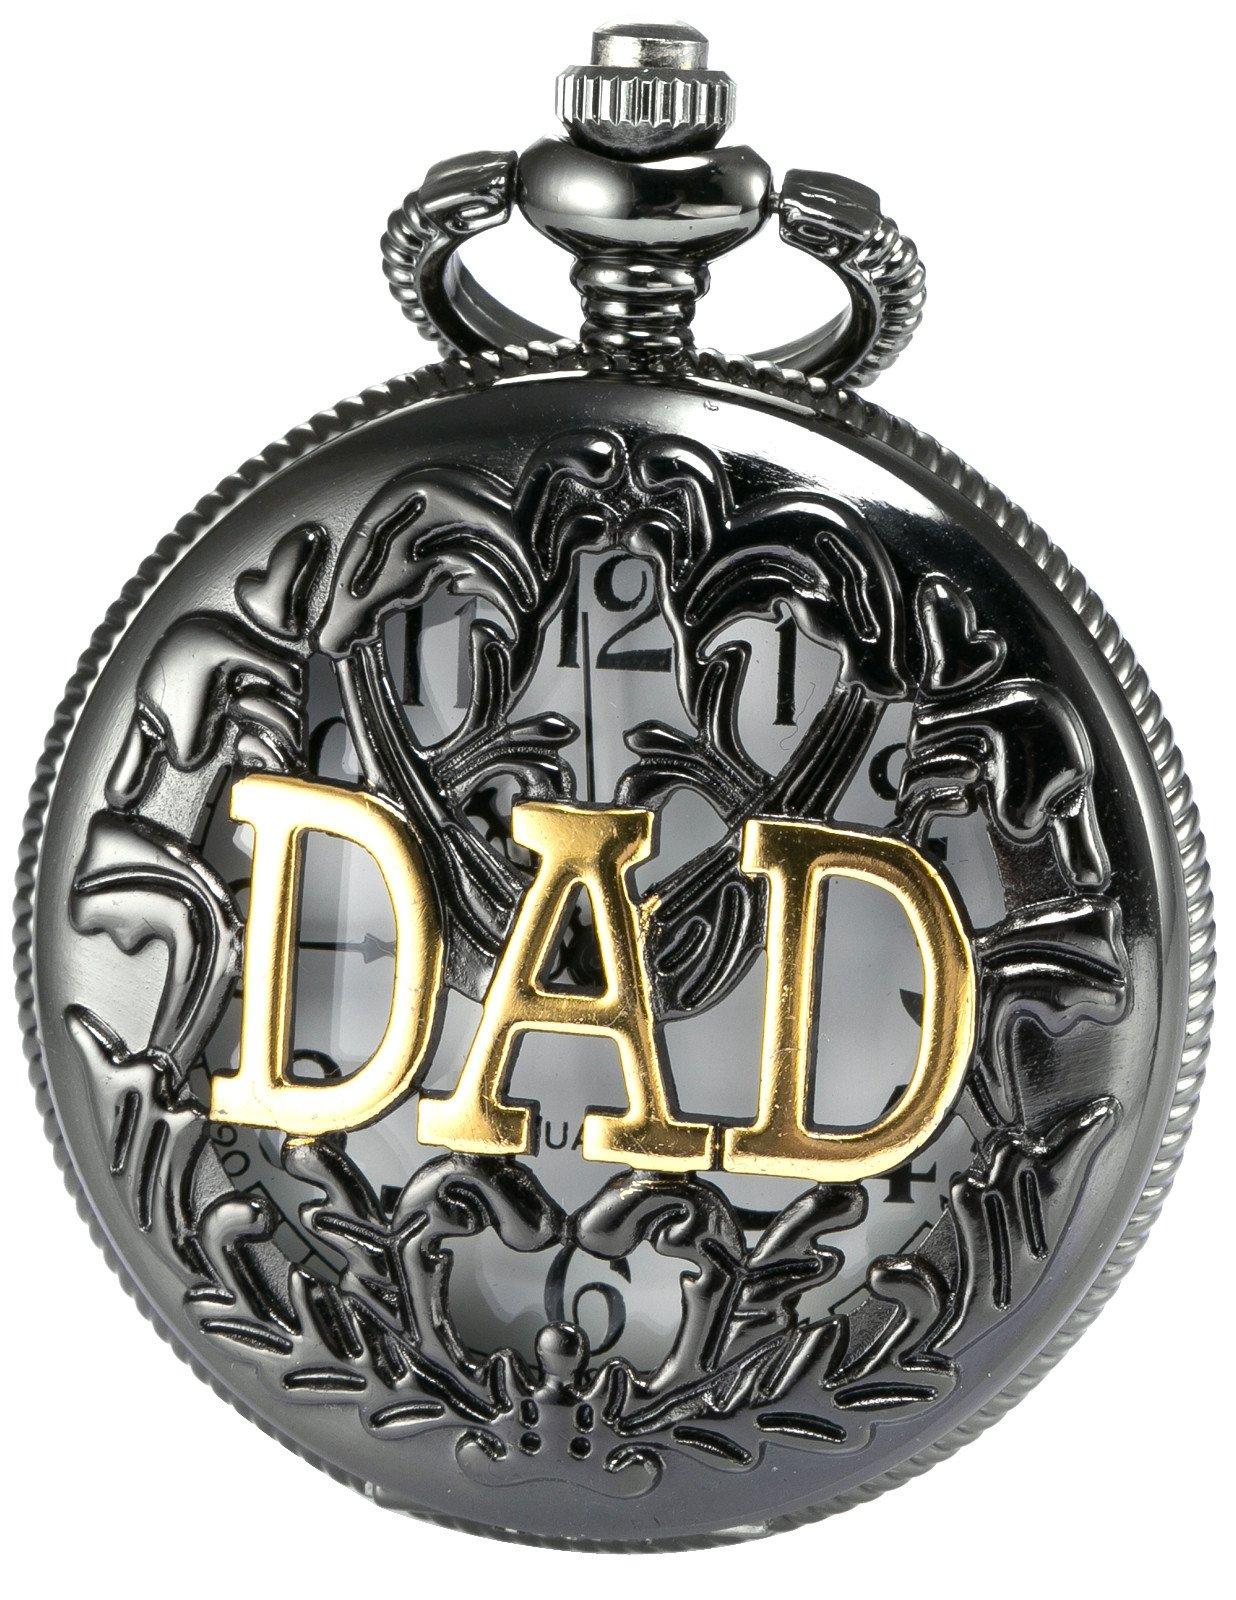 AMPM24 Women Men's Dad Black Dangle Pendant Pocket Quartz Watch Gift + Chain WPK051